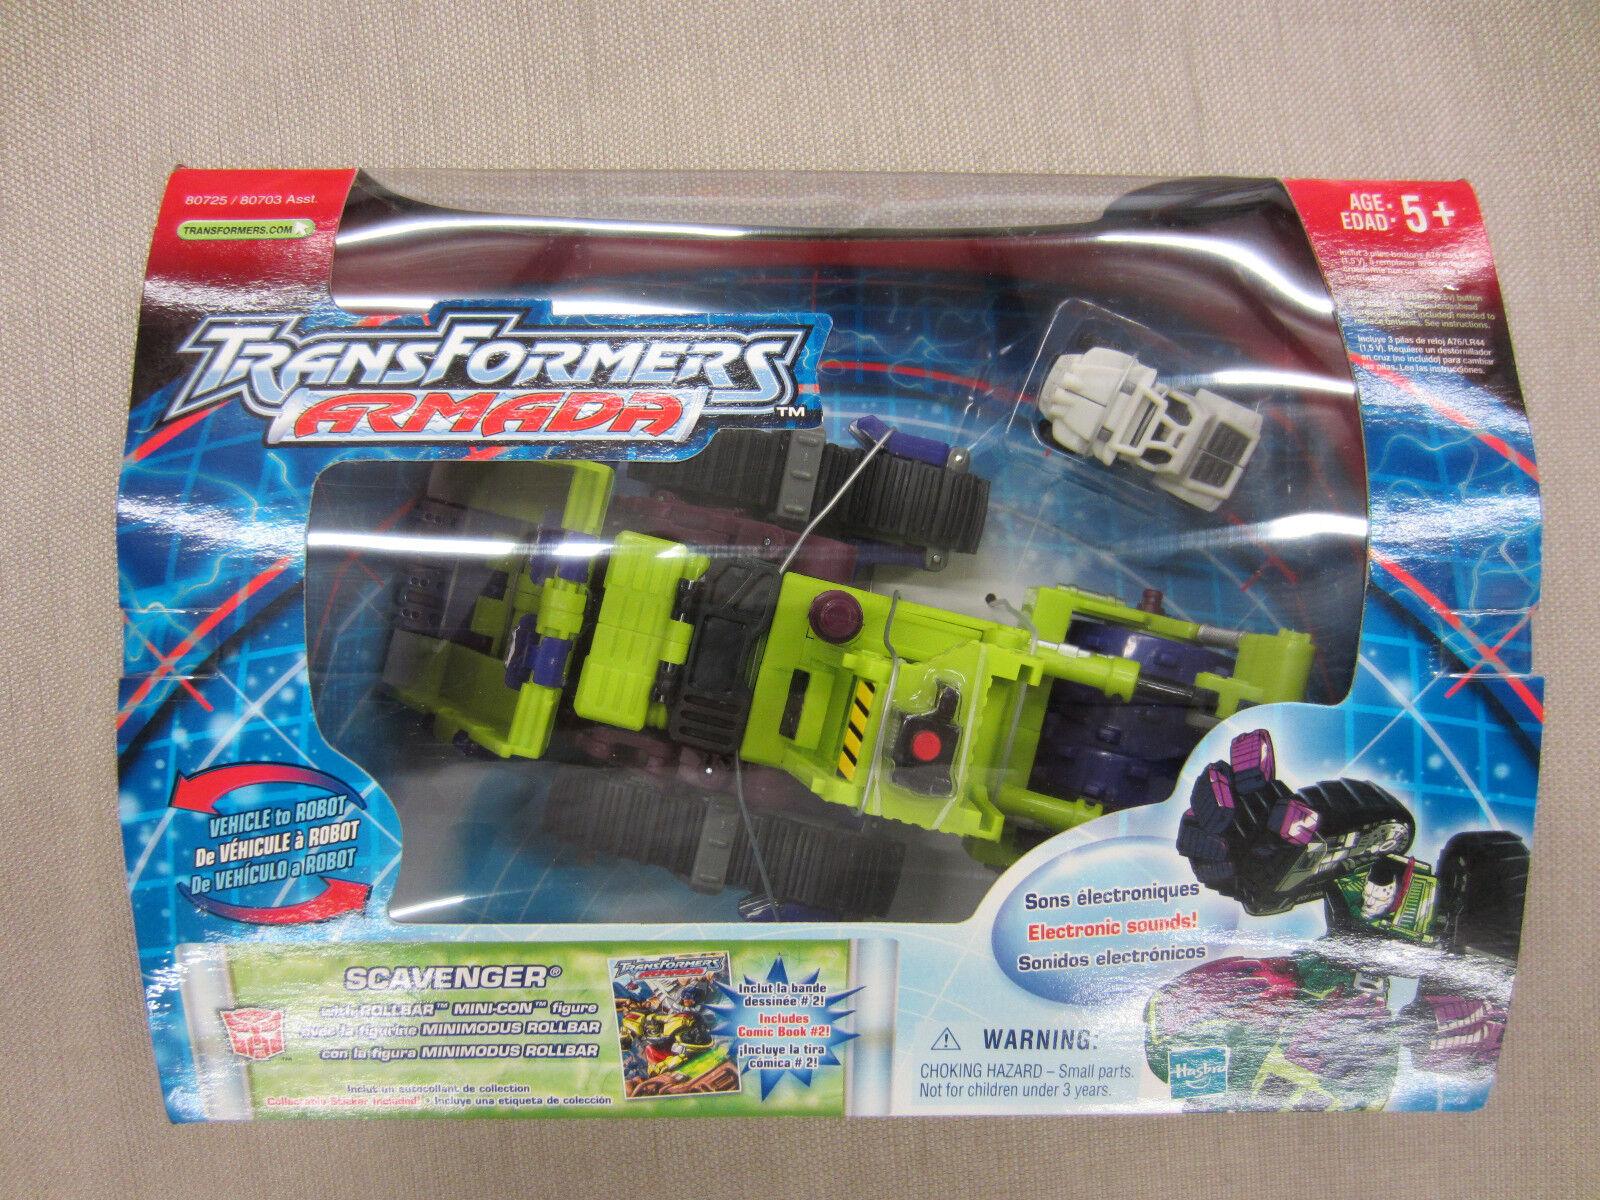 Transformers 2002 Action Figure Armada Scavenger+ mini-con and Comic Book MISB